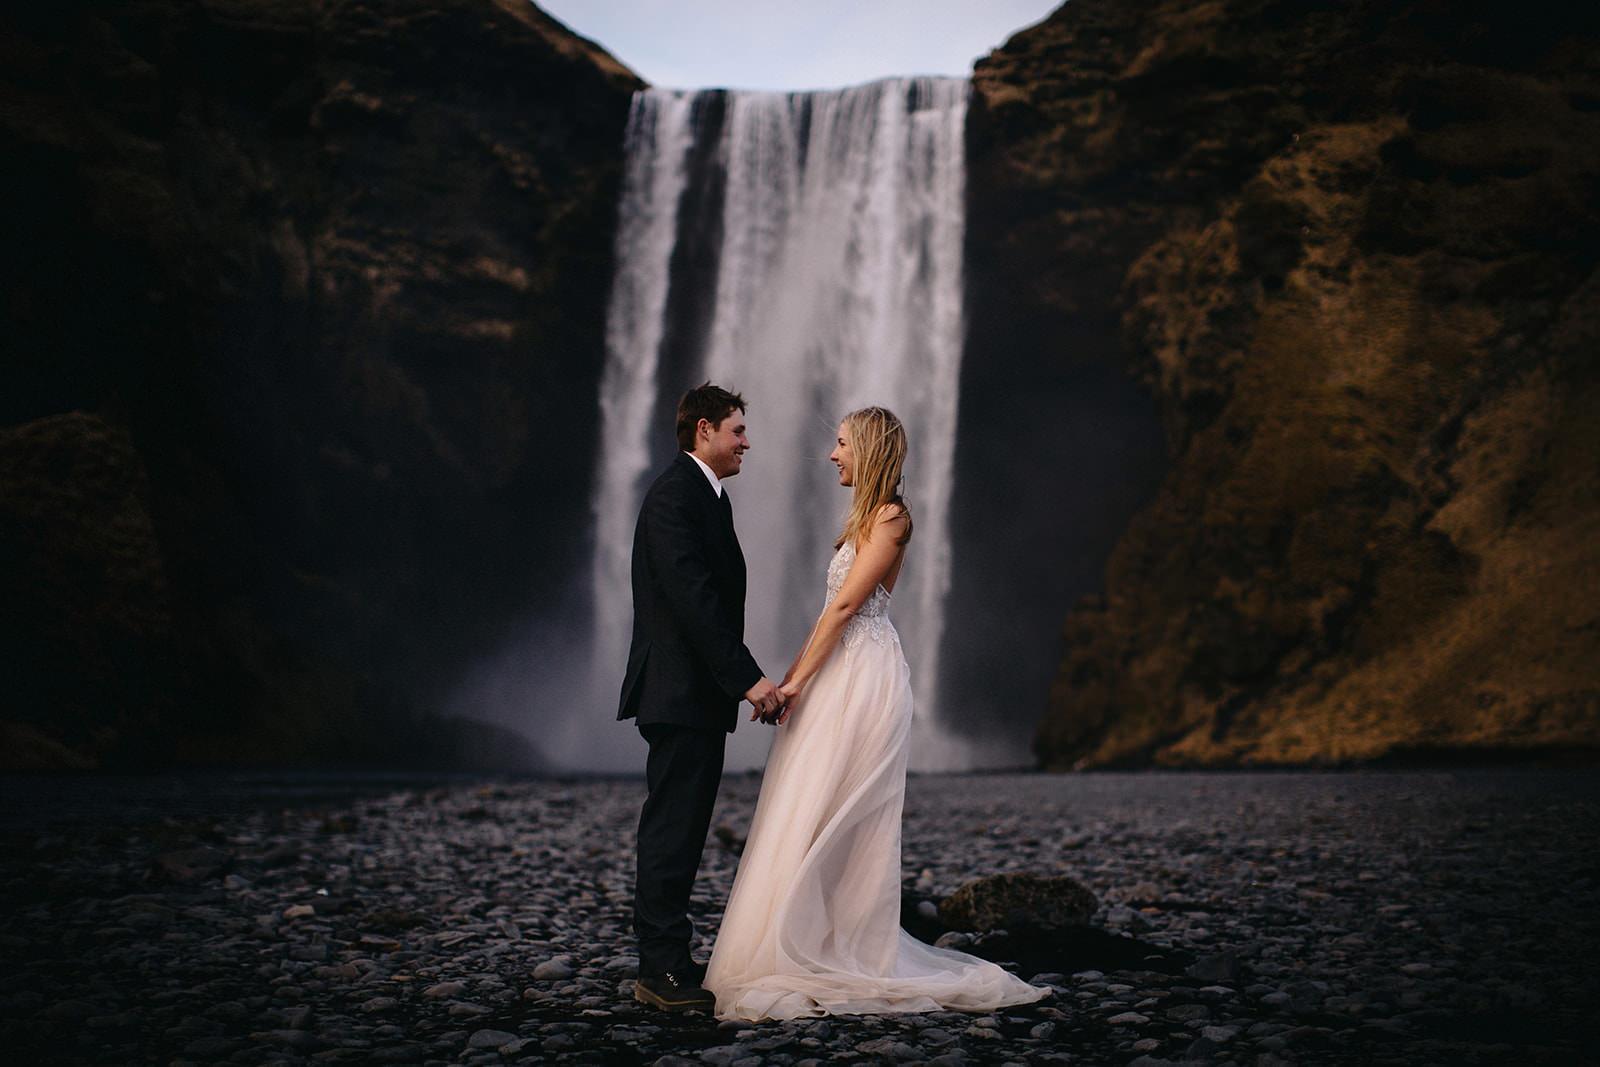 Icelandic Iceland Elopement Wedding Elope Photographer Eloping Reykjavík Vik Black Sand Beach Jökulsárlón Skogafoss Waterfall Vestrahorn Mountain Liz Osban Photography Destination 97.jpg